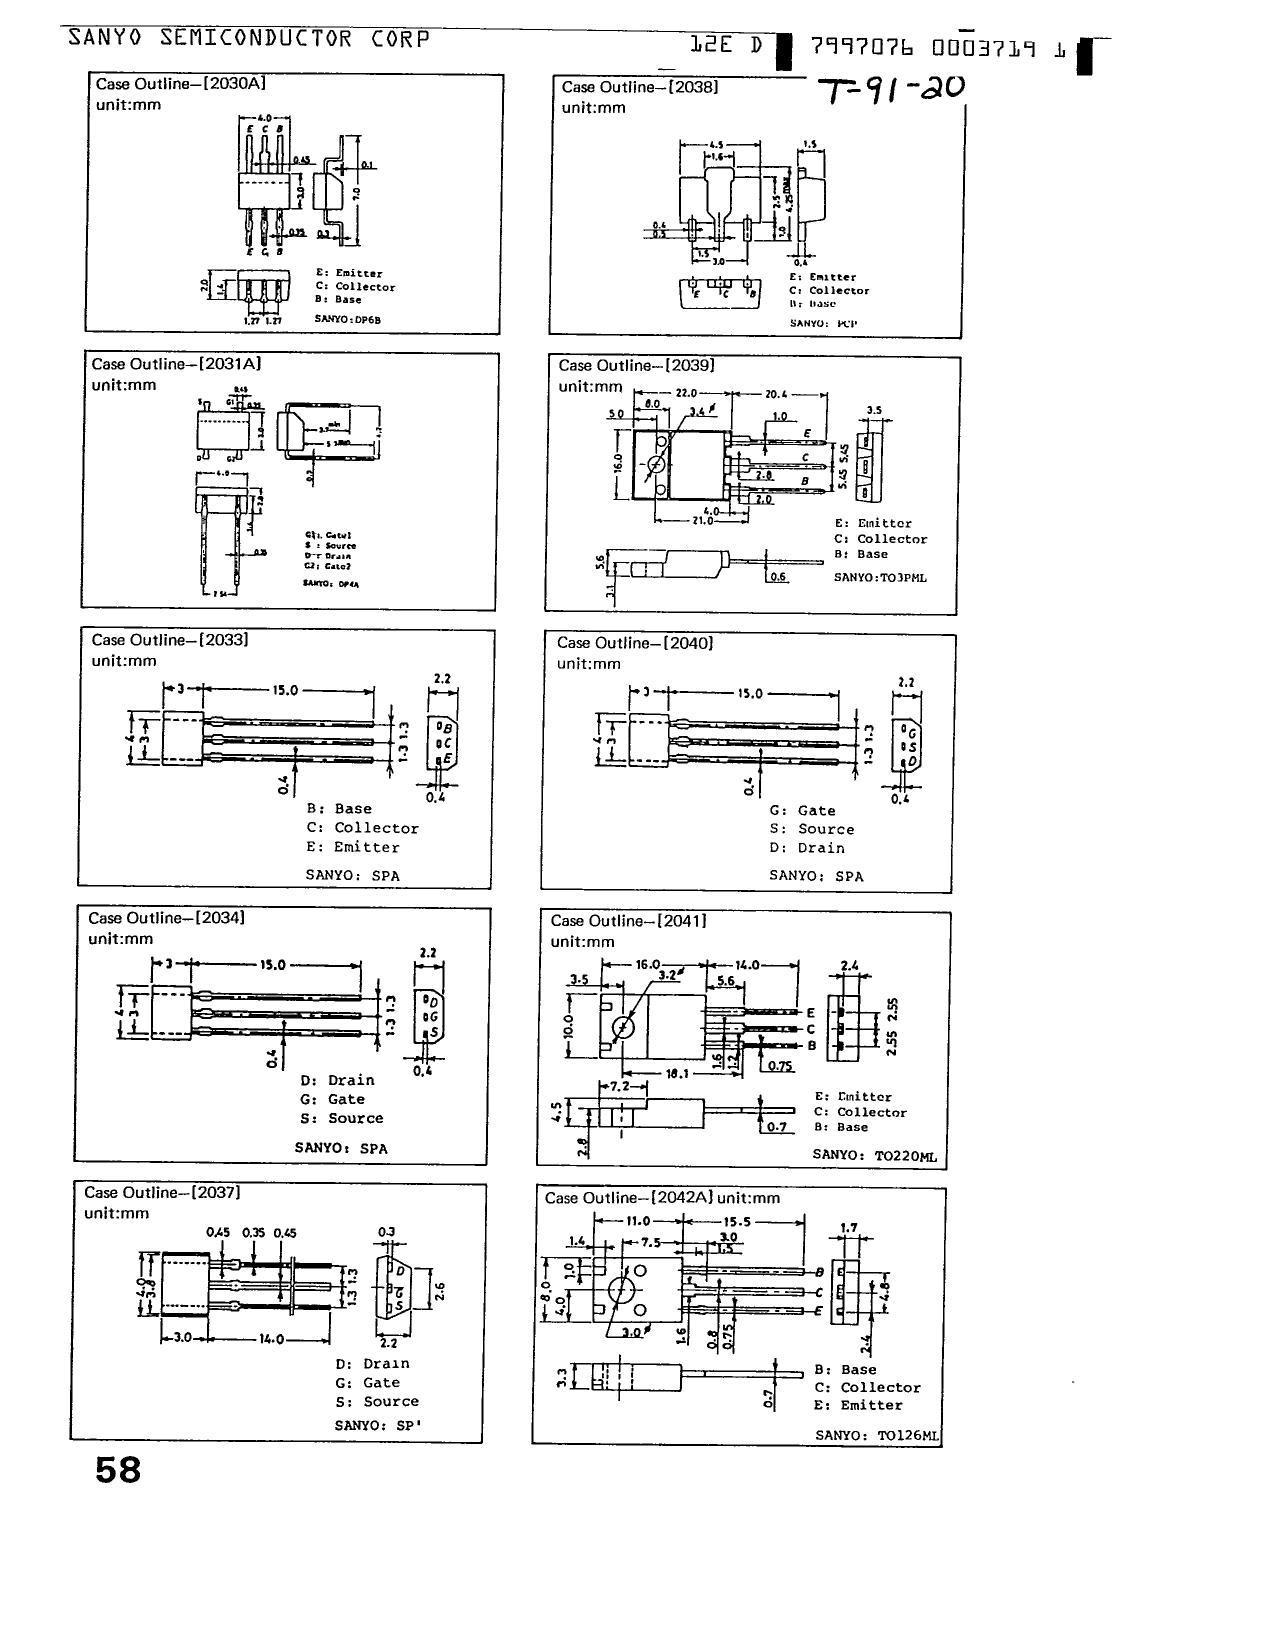 C1571 電子部品, 半導体